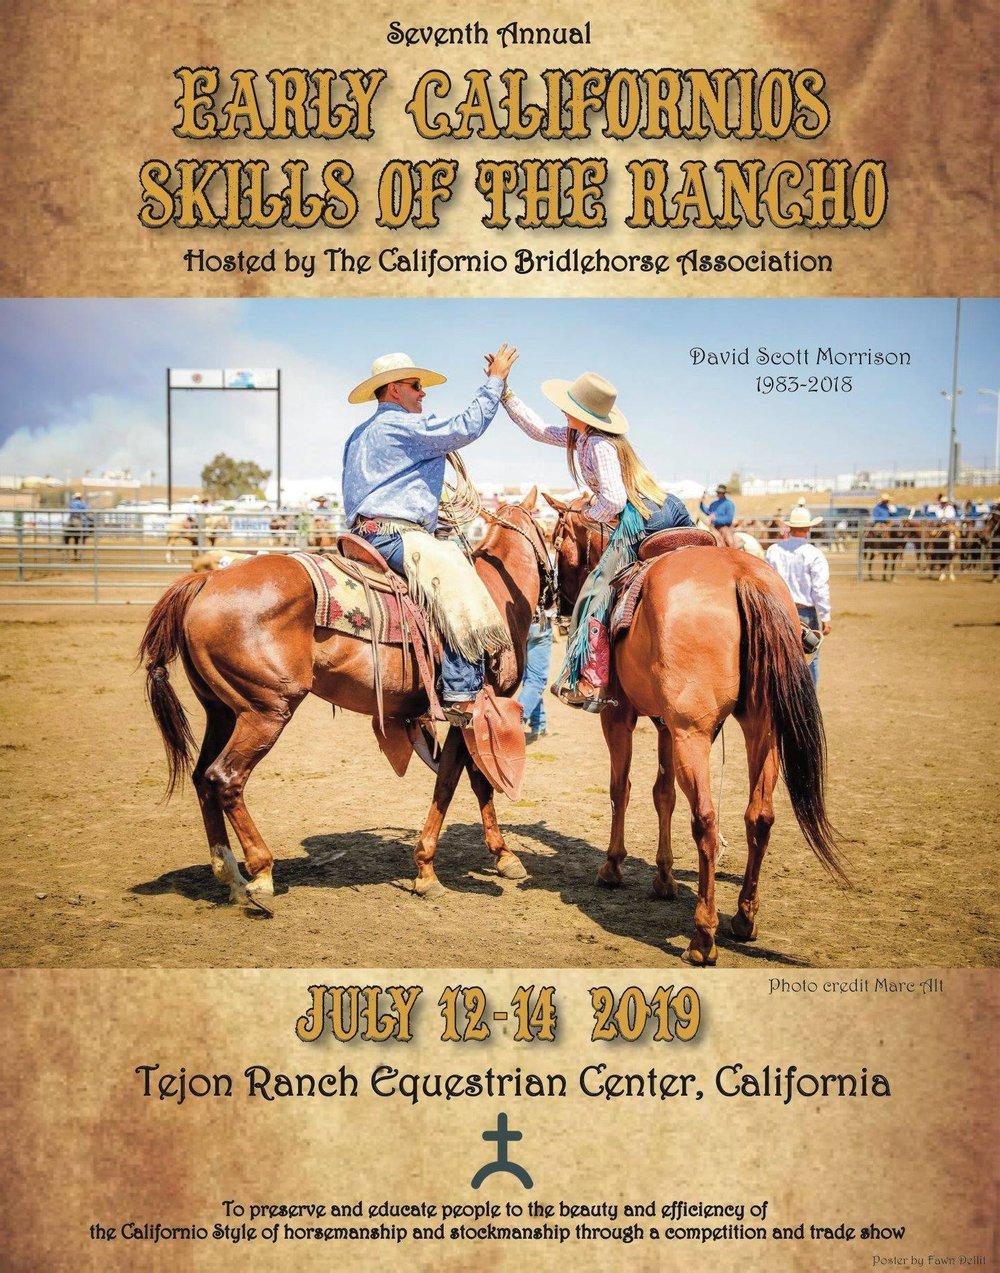 Contact: Californio Bridle Horse Association